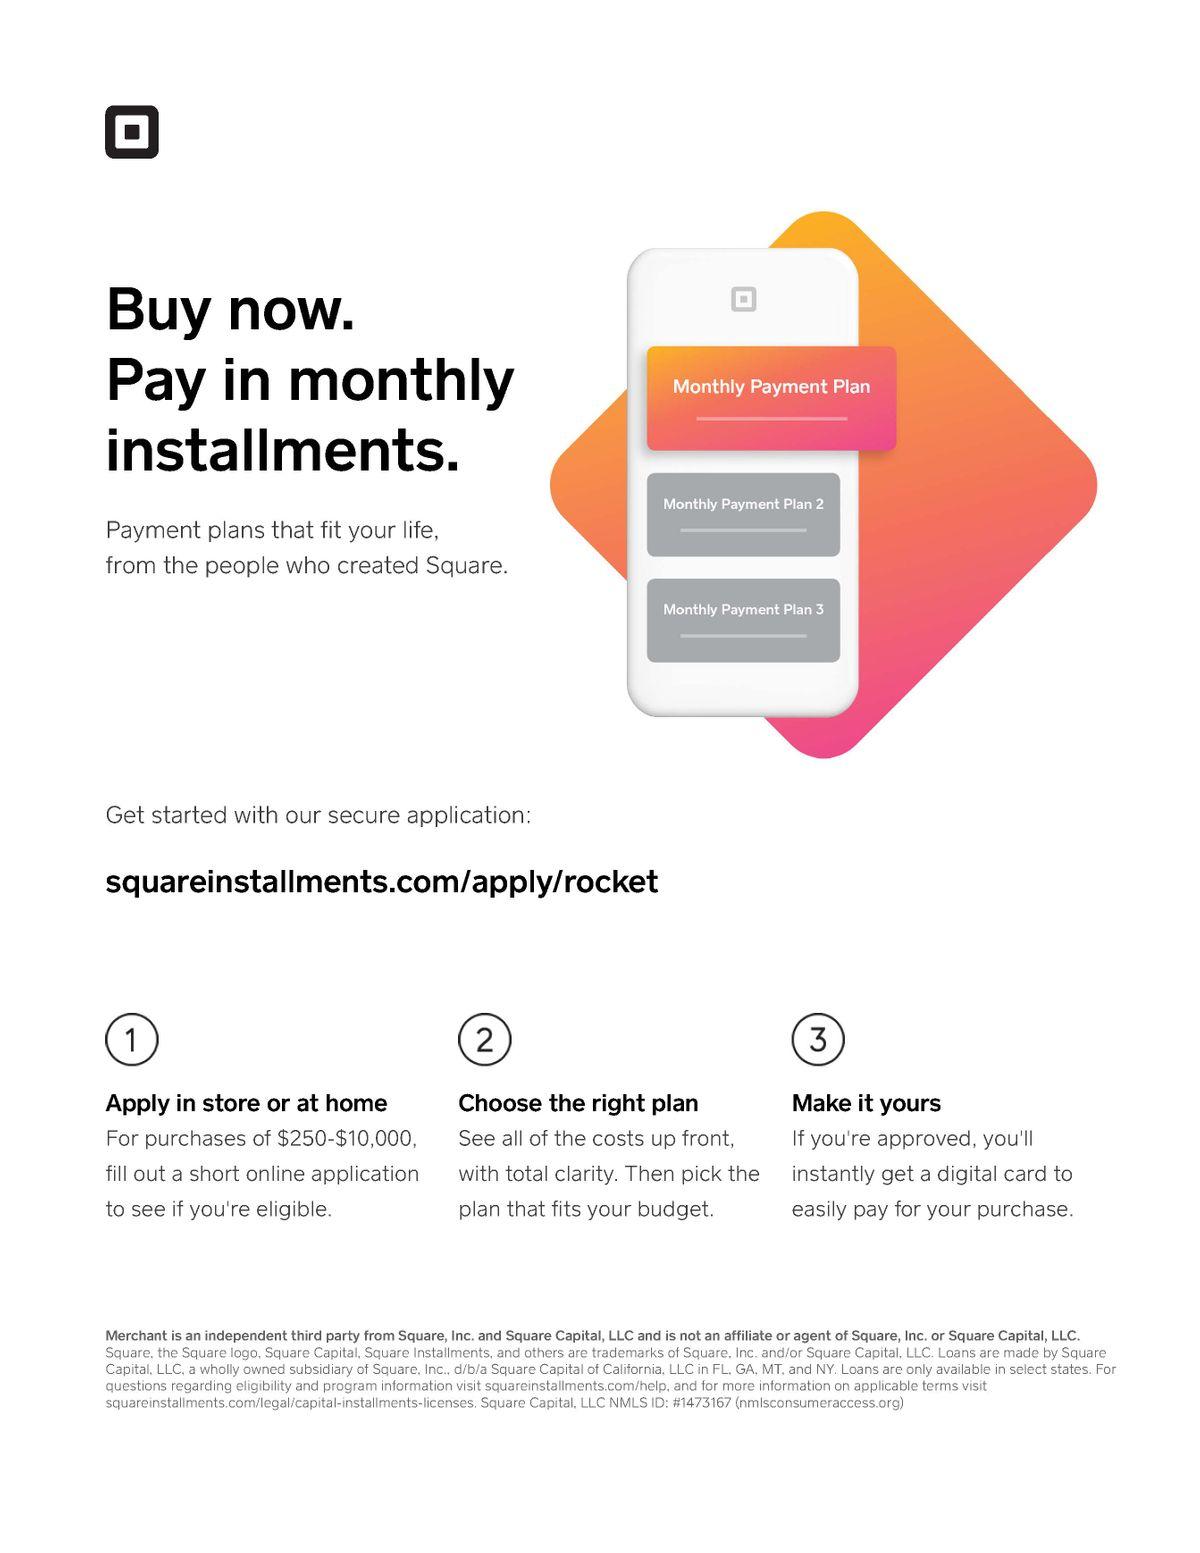 square_seller_marketing_handout_1552928853.jpg